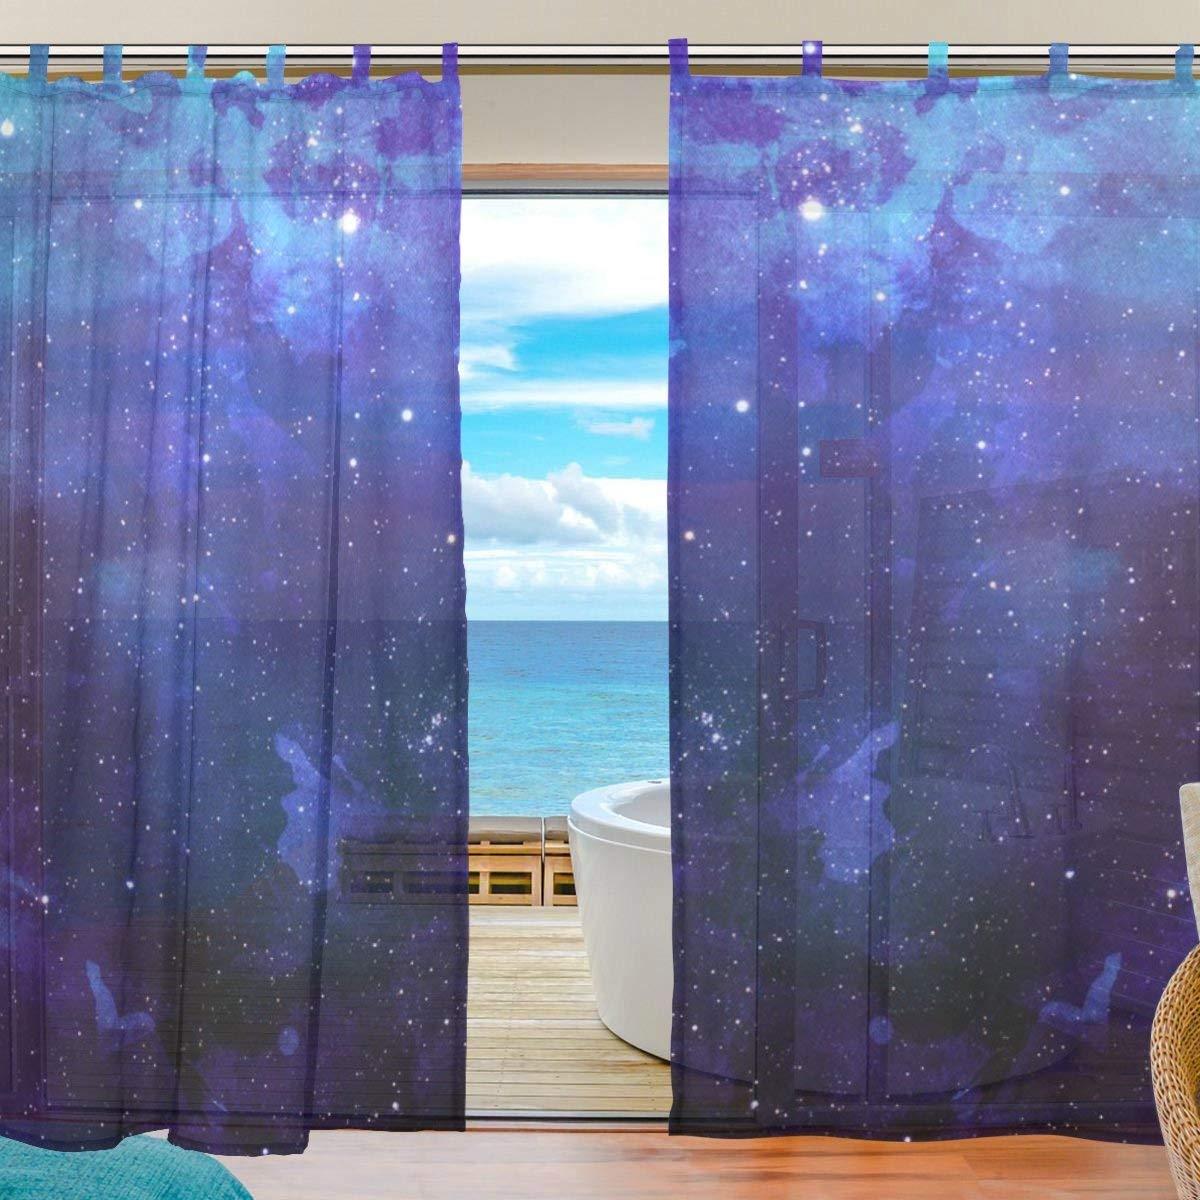 ZOMOY(ユサキ おしゃれ 薄手 柔らかい シェードカーテン紗 ドアカーテン,夢幻 宇宙柄 星空 星,装飾 窓 部屋 玄関 ベッドルーム 客間用 遮光 カーテン (幅:140cm x丈:210cmx2枚組)   B07PG6WRZ7